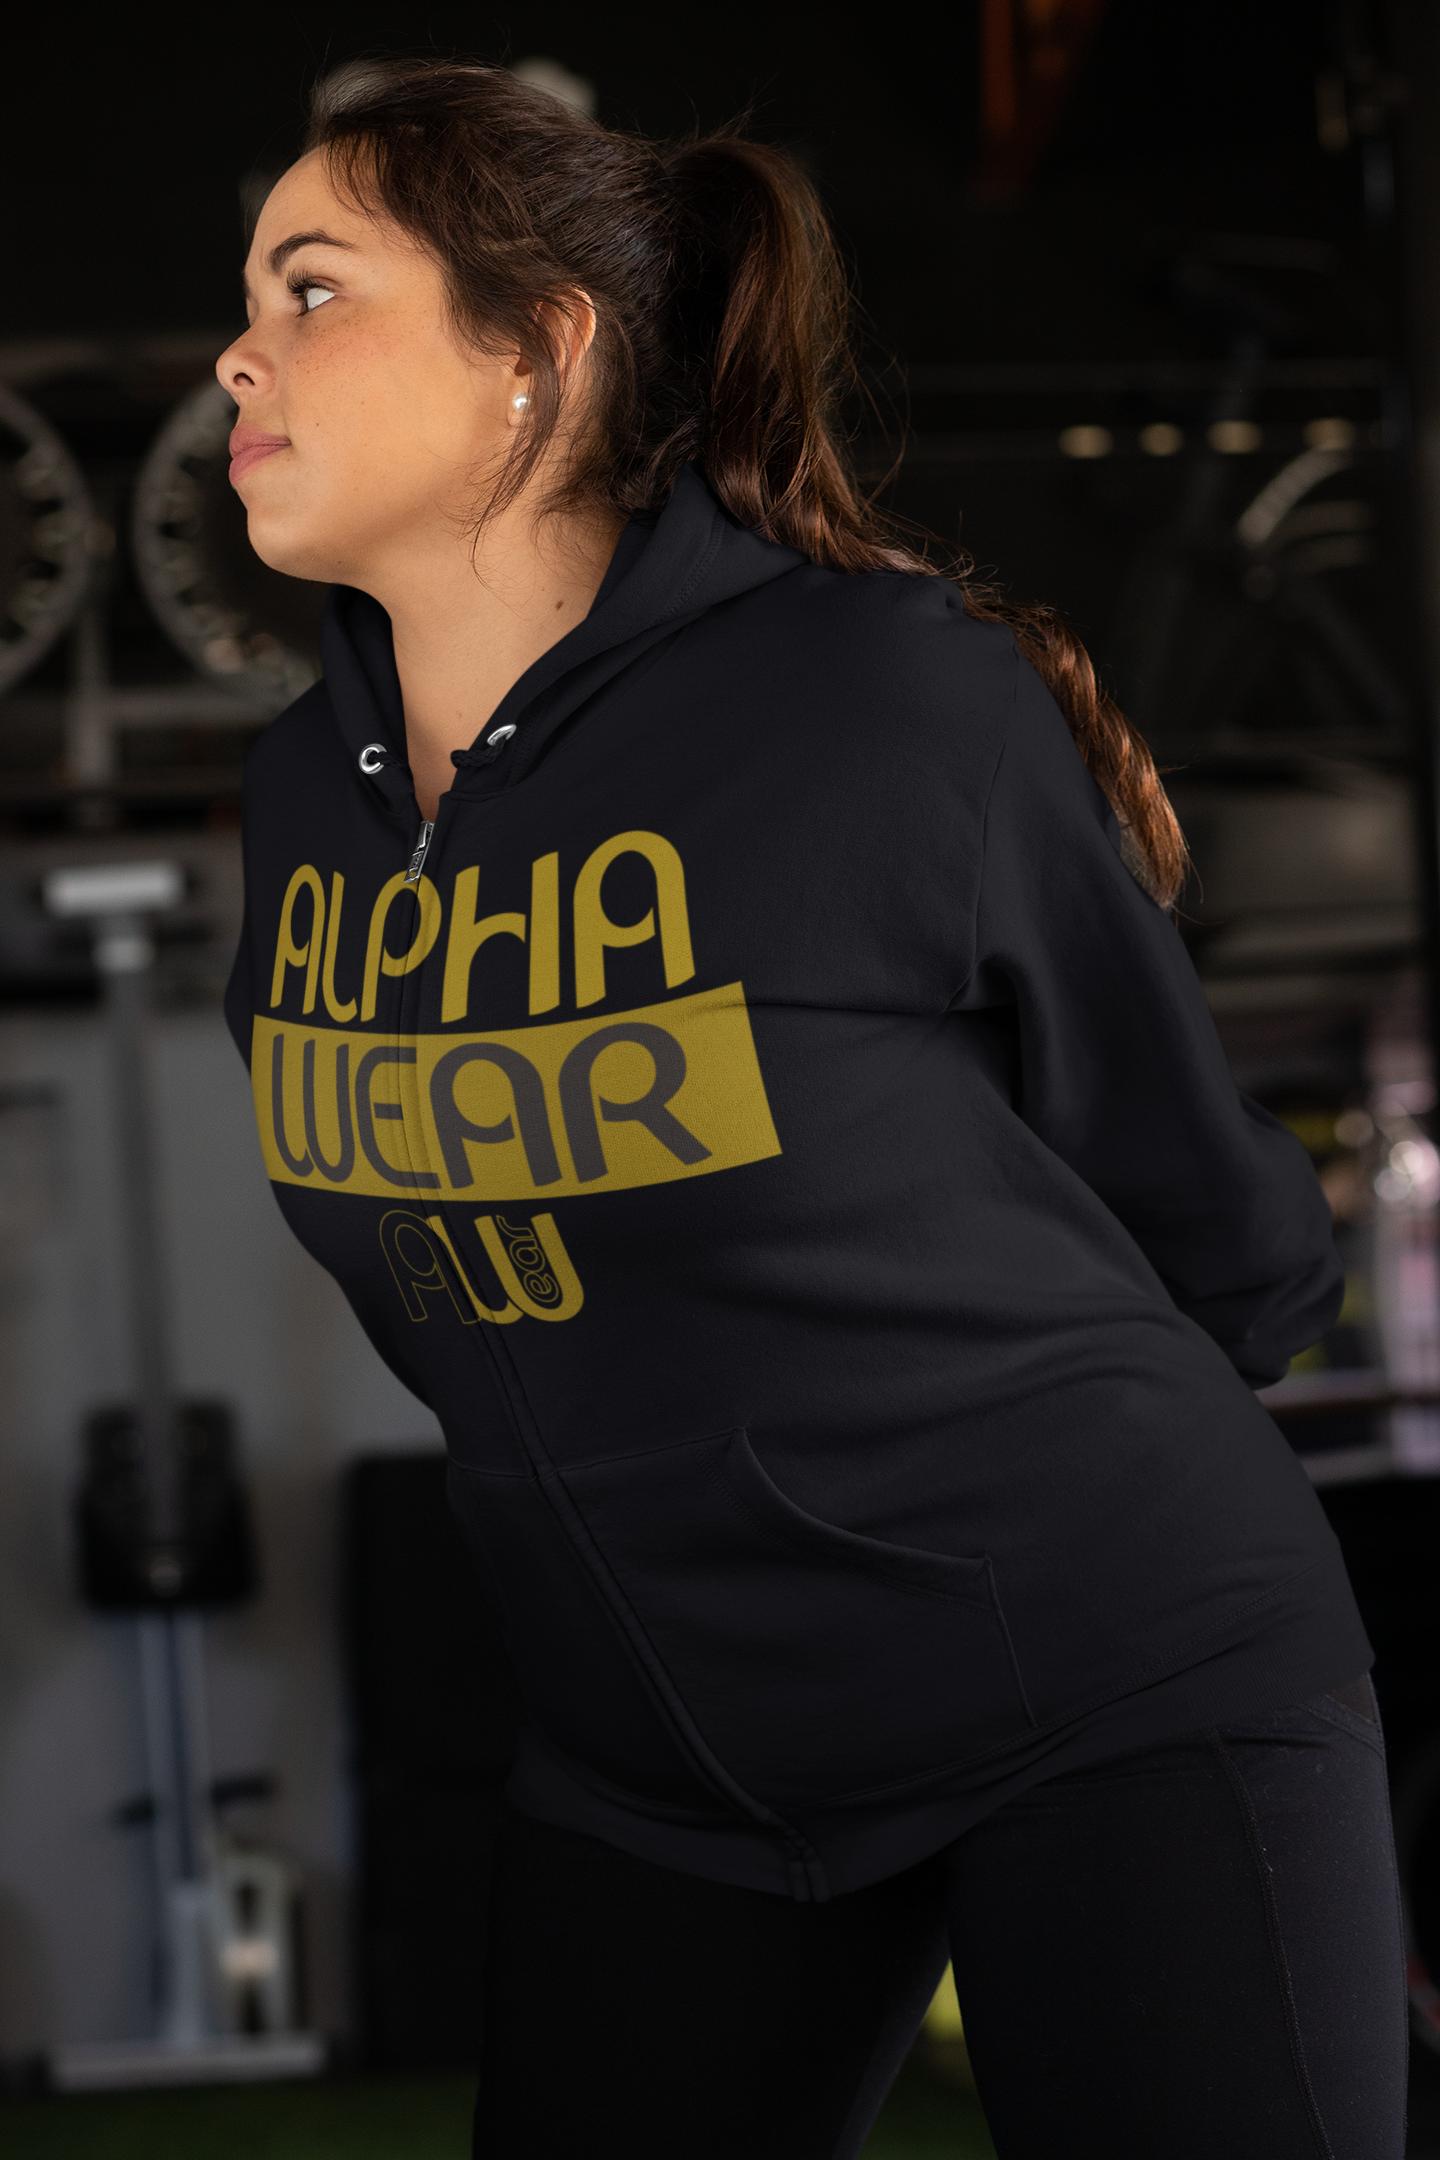 plus-size-full-zip-hoodie-mockup-of-a-wo